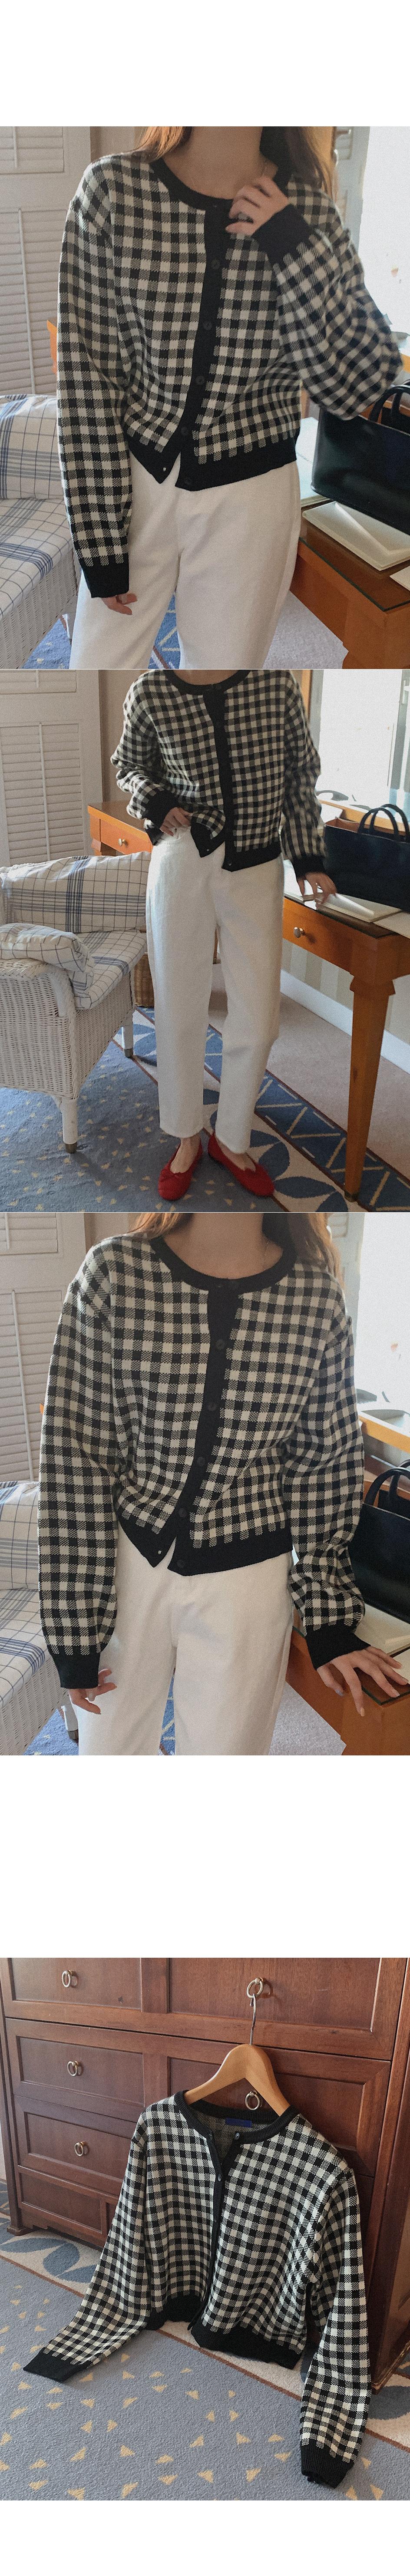 Mefalls check cardigan